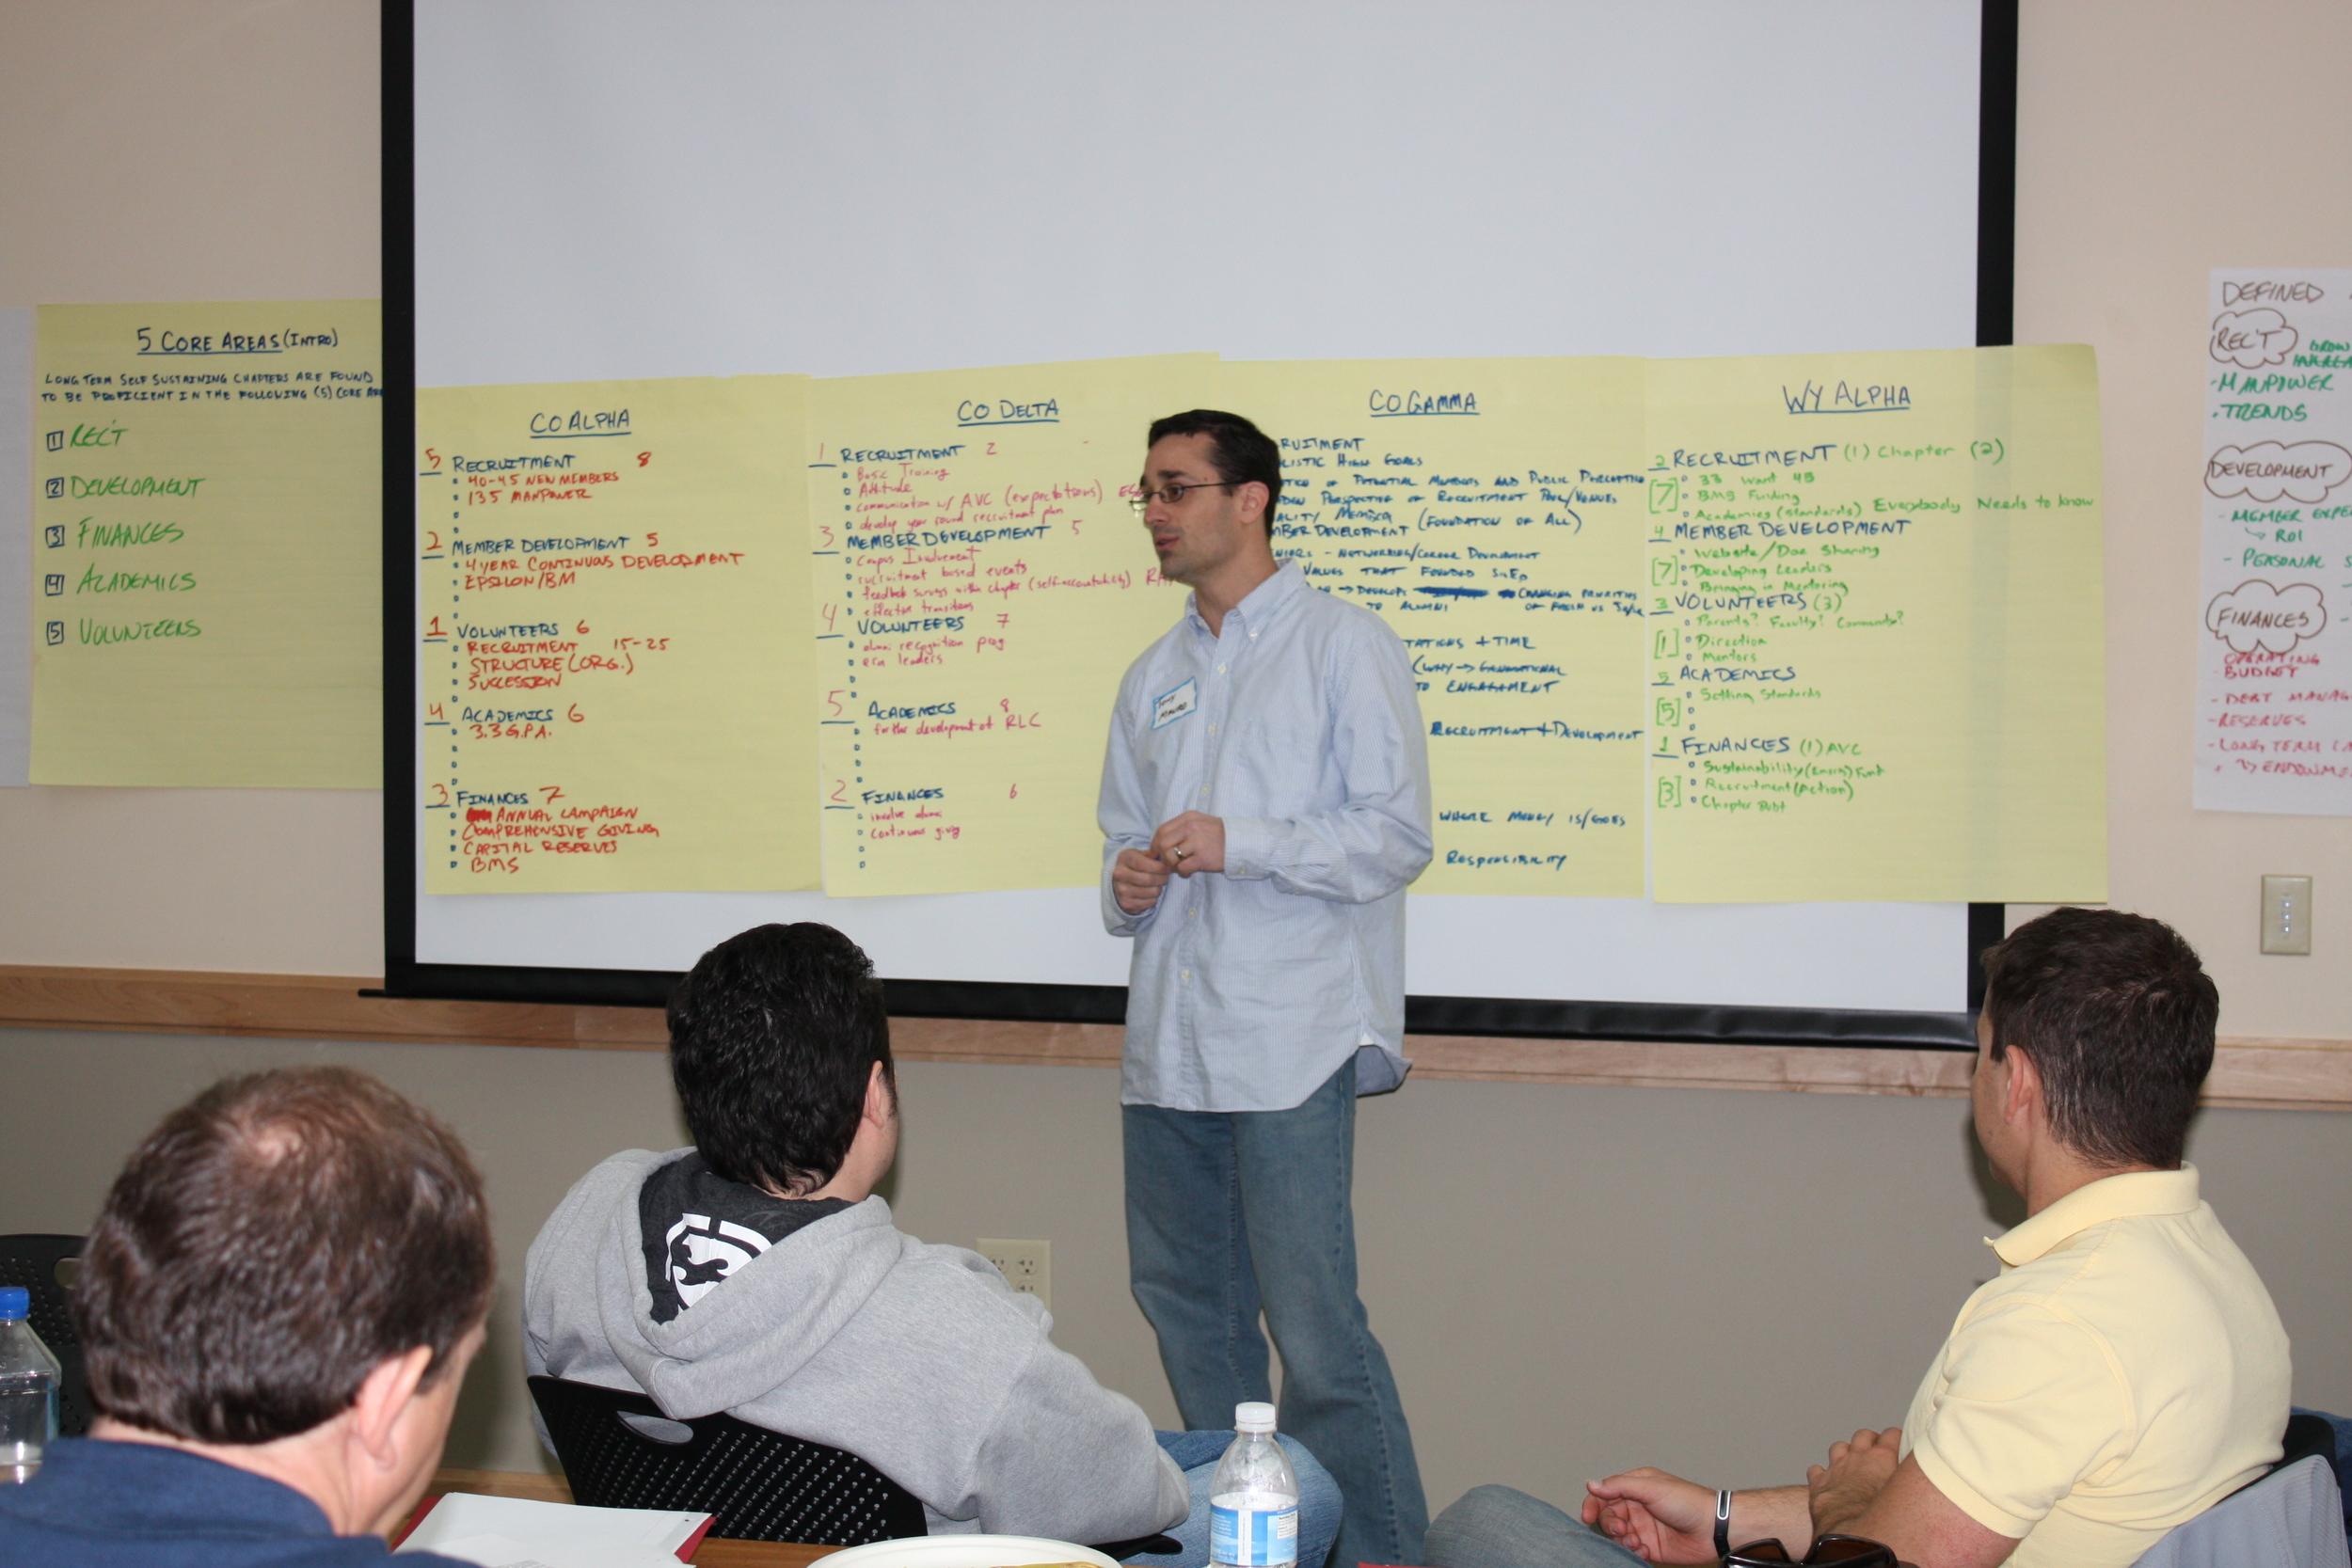 2009 Colorado-Wyoming Alumni Retreat - Tony Mauro '99